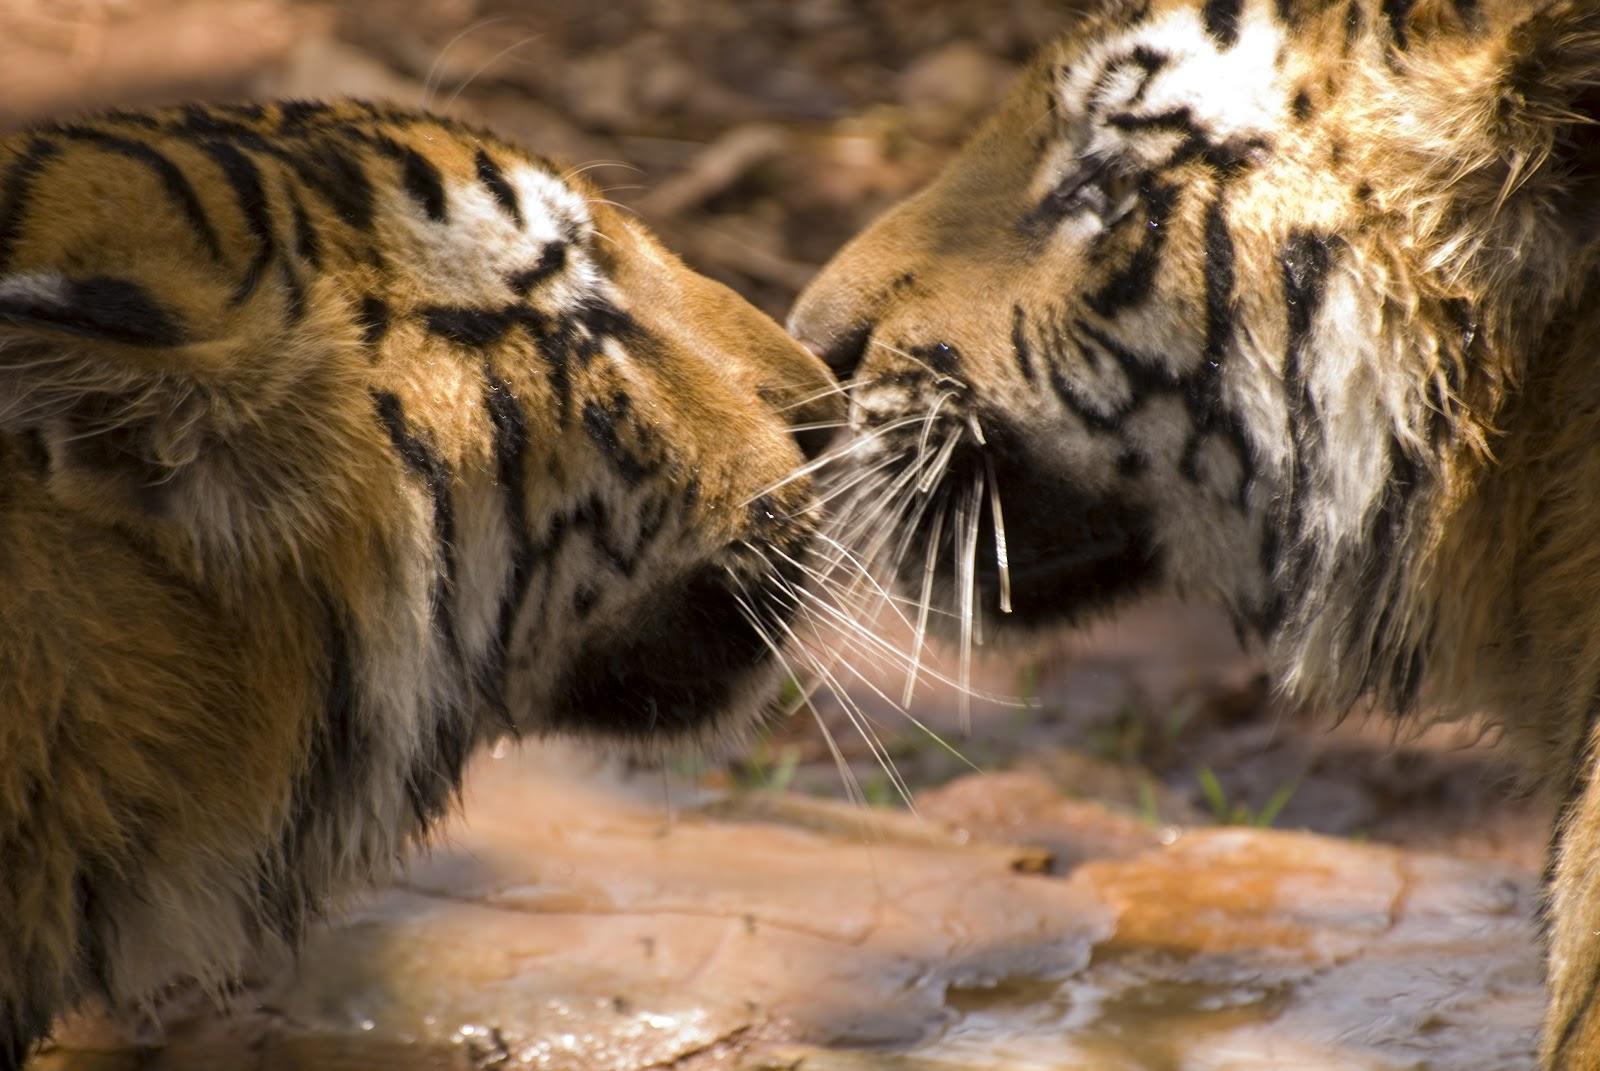 http://2.bp.blogspot.com/-hf71-MRH0Vo/UBUO0INTt1I/AAAAAAAAC1o/M59WcgpMMgE/s1600/bengal+tiger+pics+(2).jpg